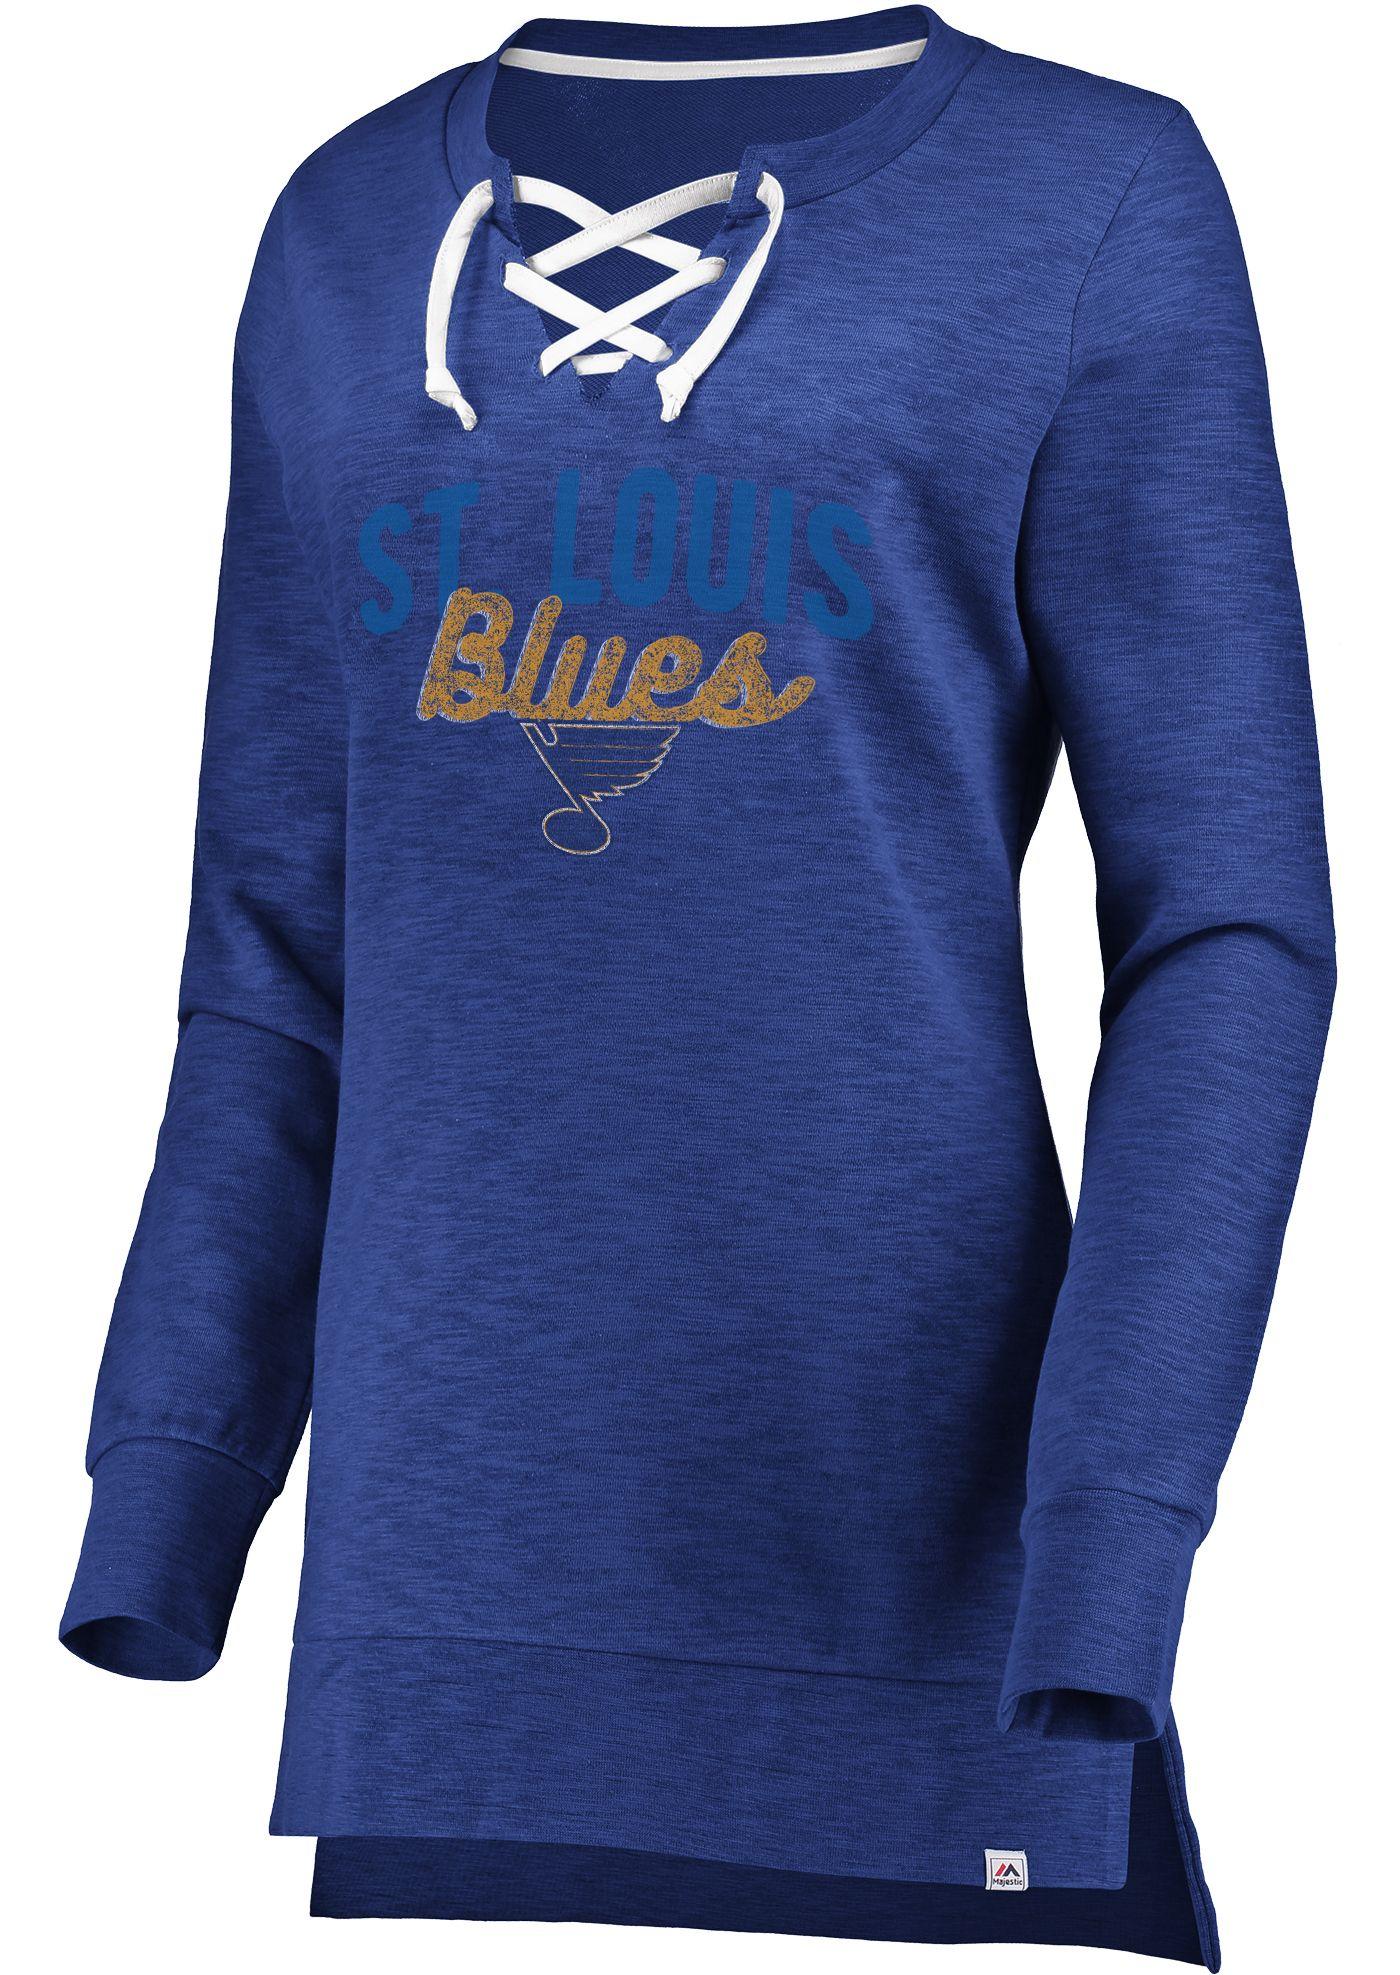 Majestic Women's St. Louis Blues Hyper Lace Blue Long Sleeve Shirt